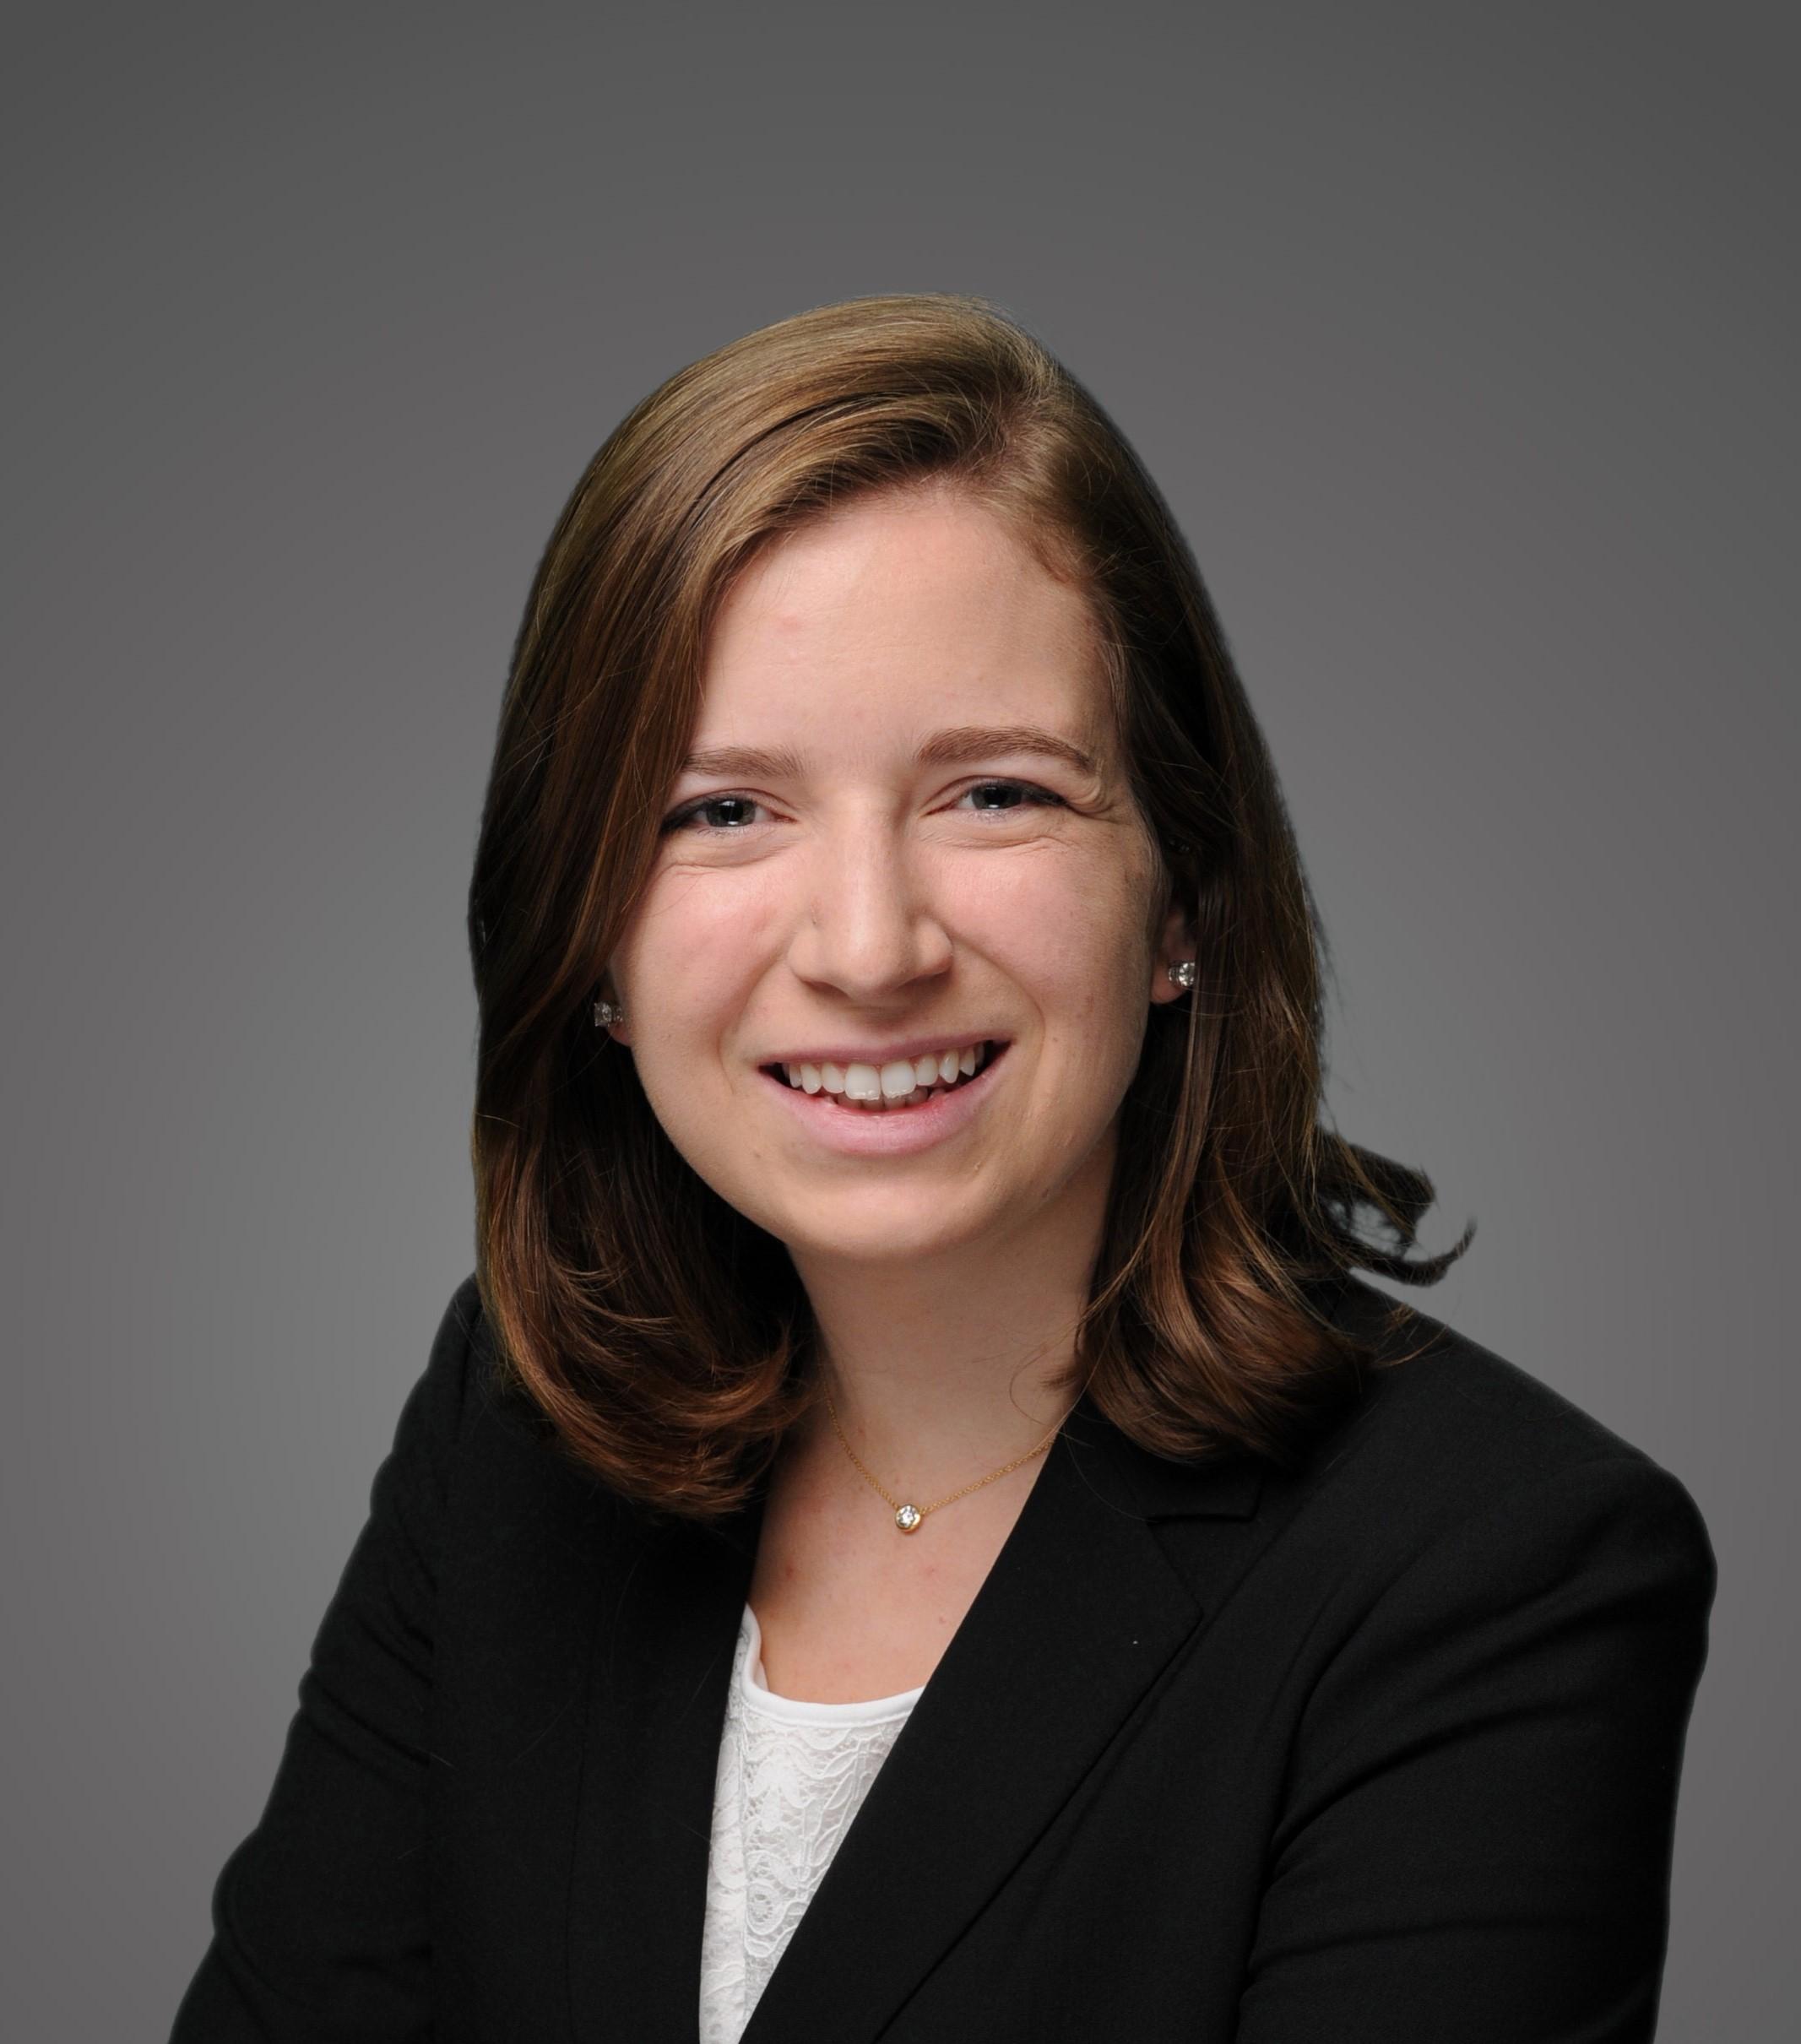 Caroline Craig   VP of Engagement  cec7@stern.nyu.edu